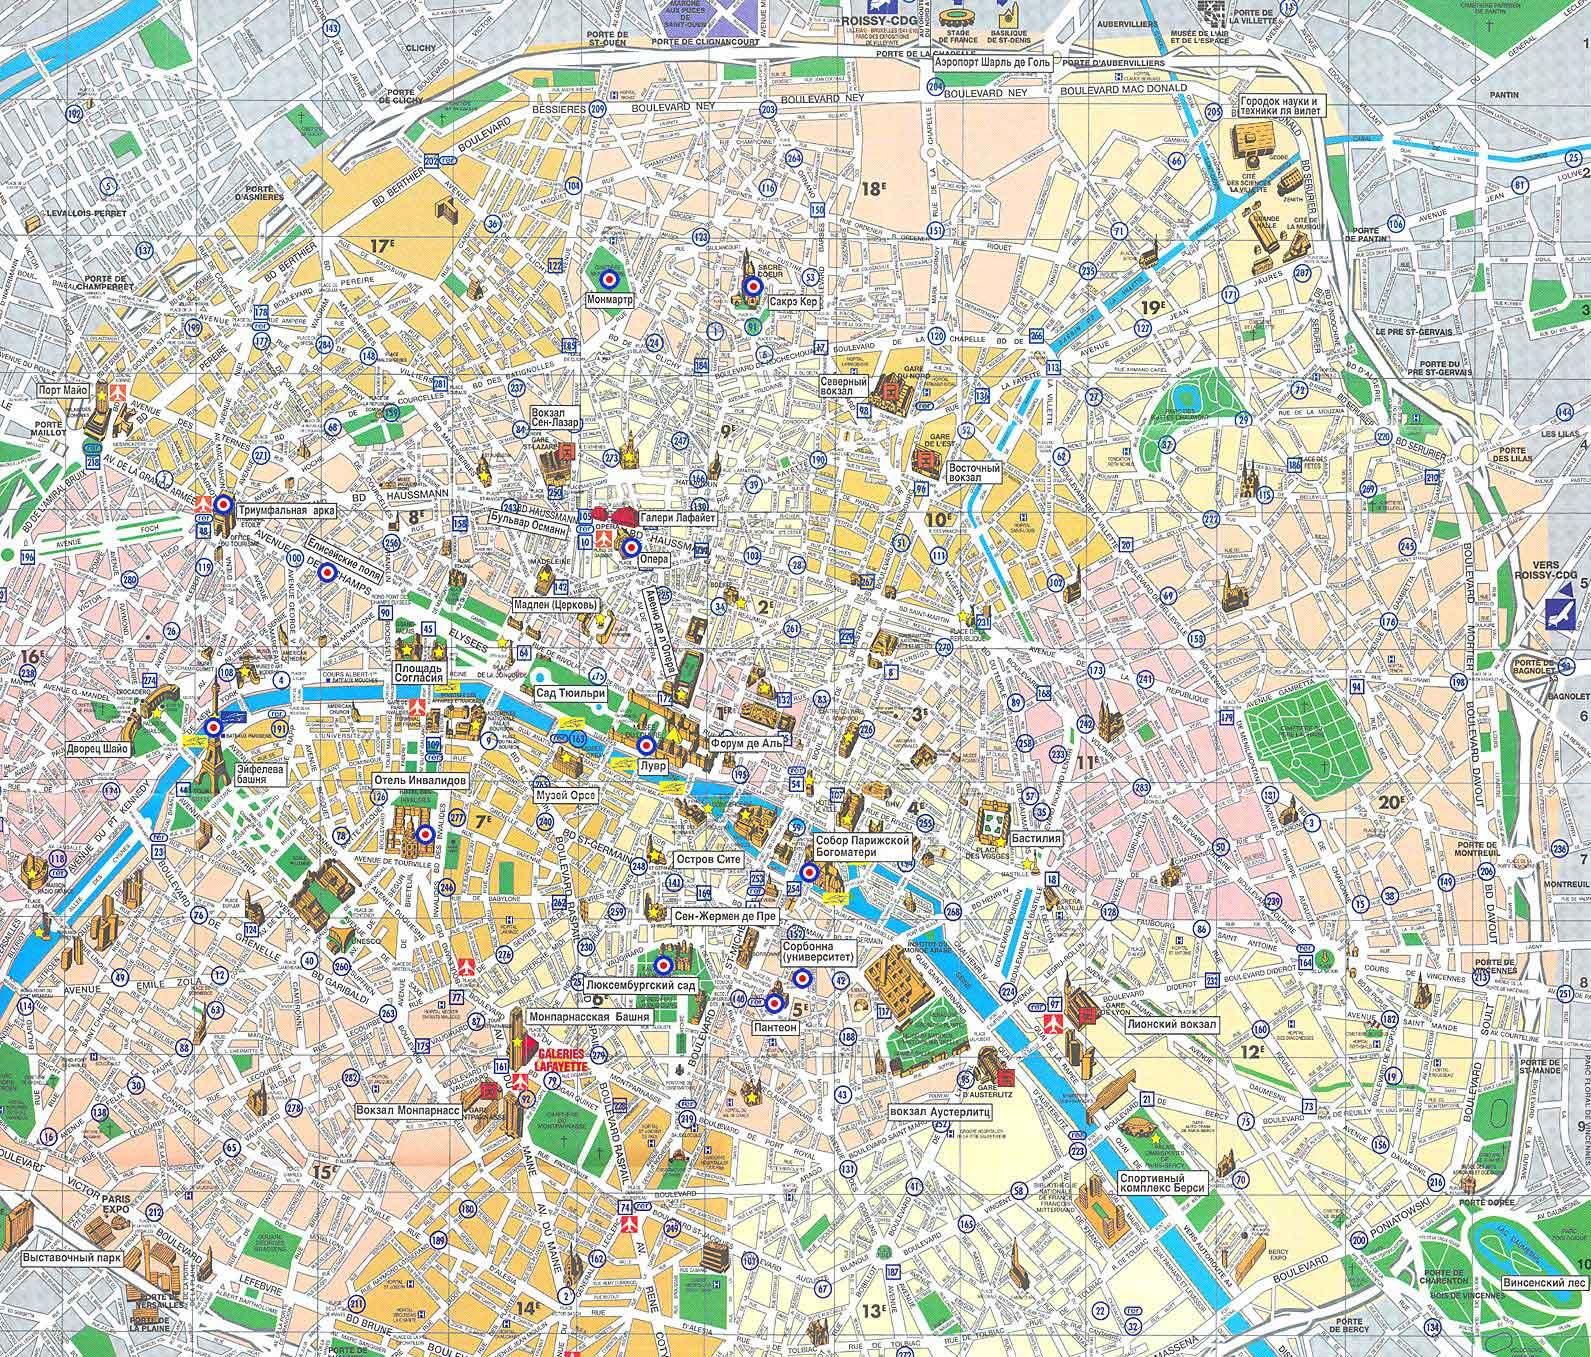 Paris Map - Detailed City And Metro Maps Of Paris For Download - Printable Map Of Paris City Centre